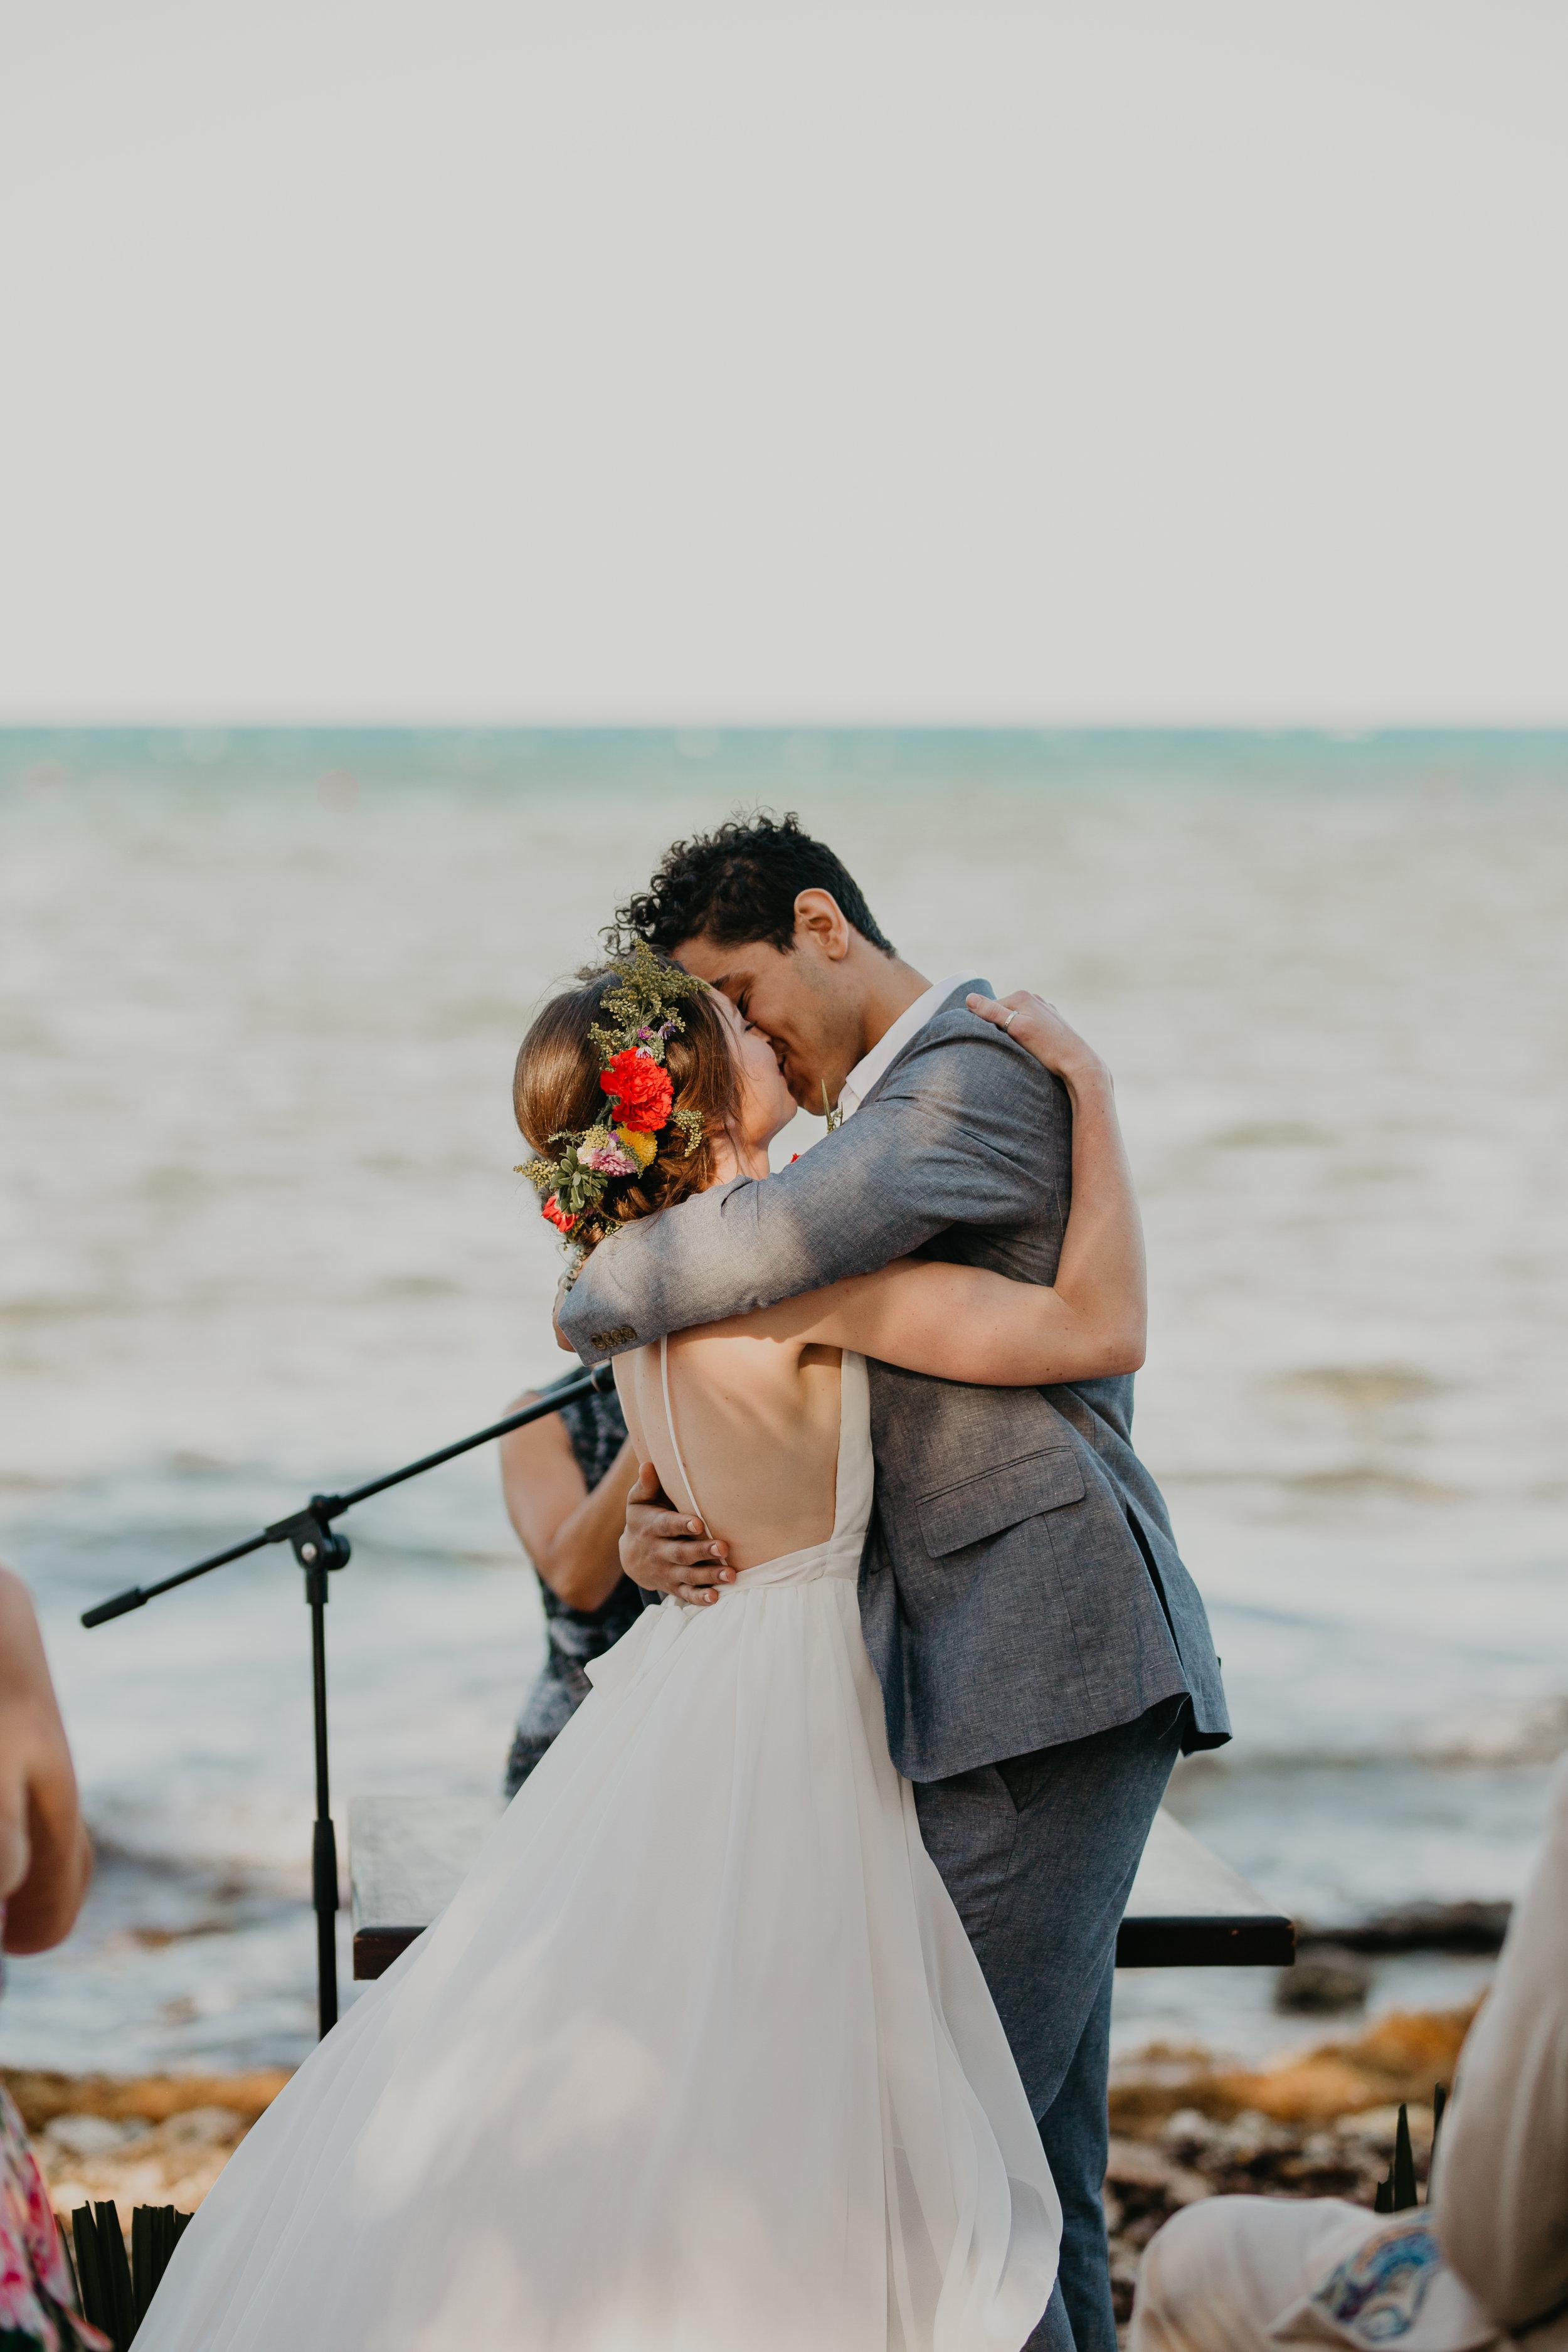 Nicole-Daacke-Photography-beachfront-akumal-destionation-wedding-tulum-mexico-elopement-photographer-destination-wedding-inspiration-sunset-champagne-pop-boho-bride-ocean-tropical-bohemian-tulum-wedding-photos-169.jpg